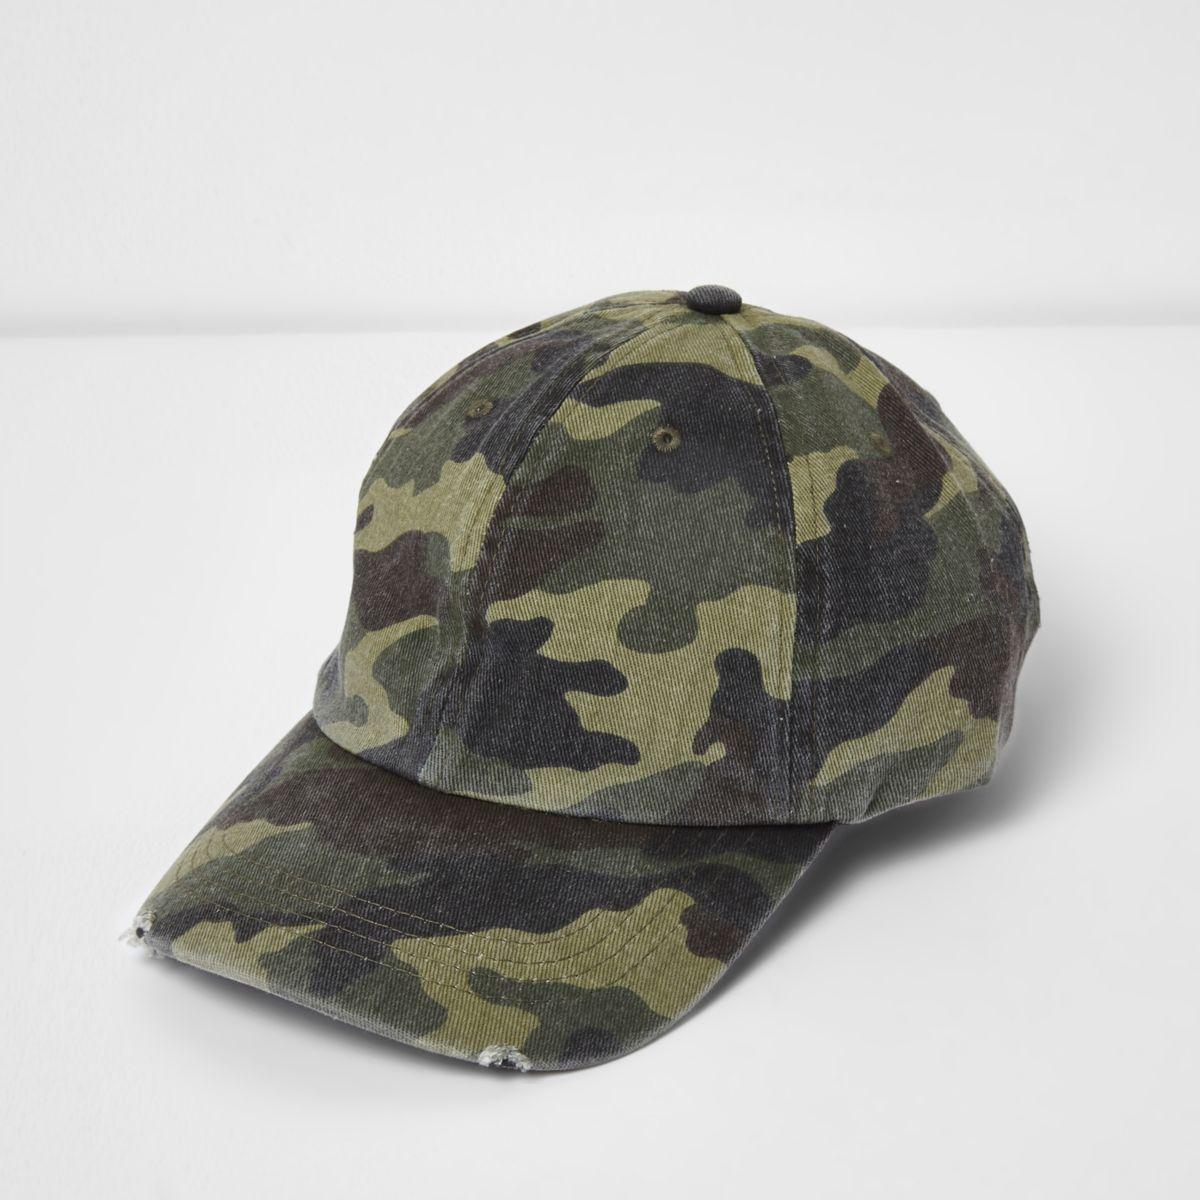 Green washed camo baseball cap